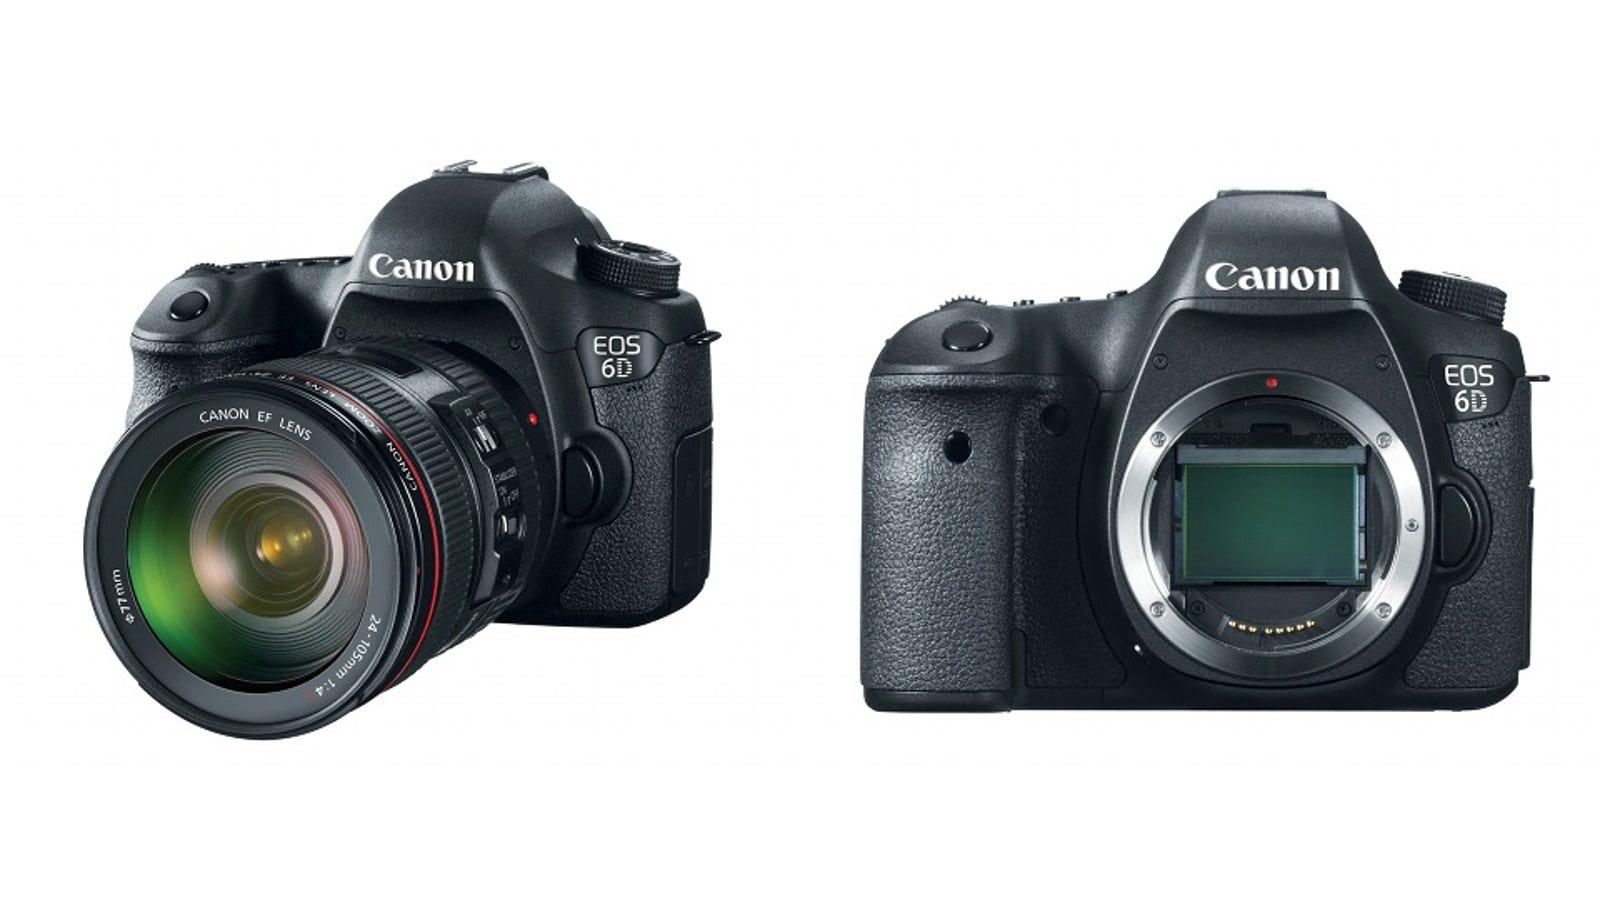 Canon Eos 6d The Cheapest Full Frame Hd Video Dslr Ever